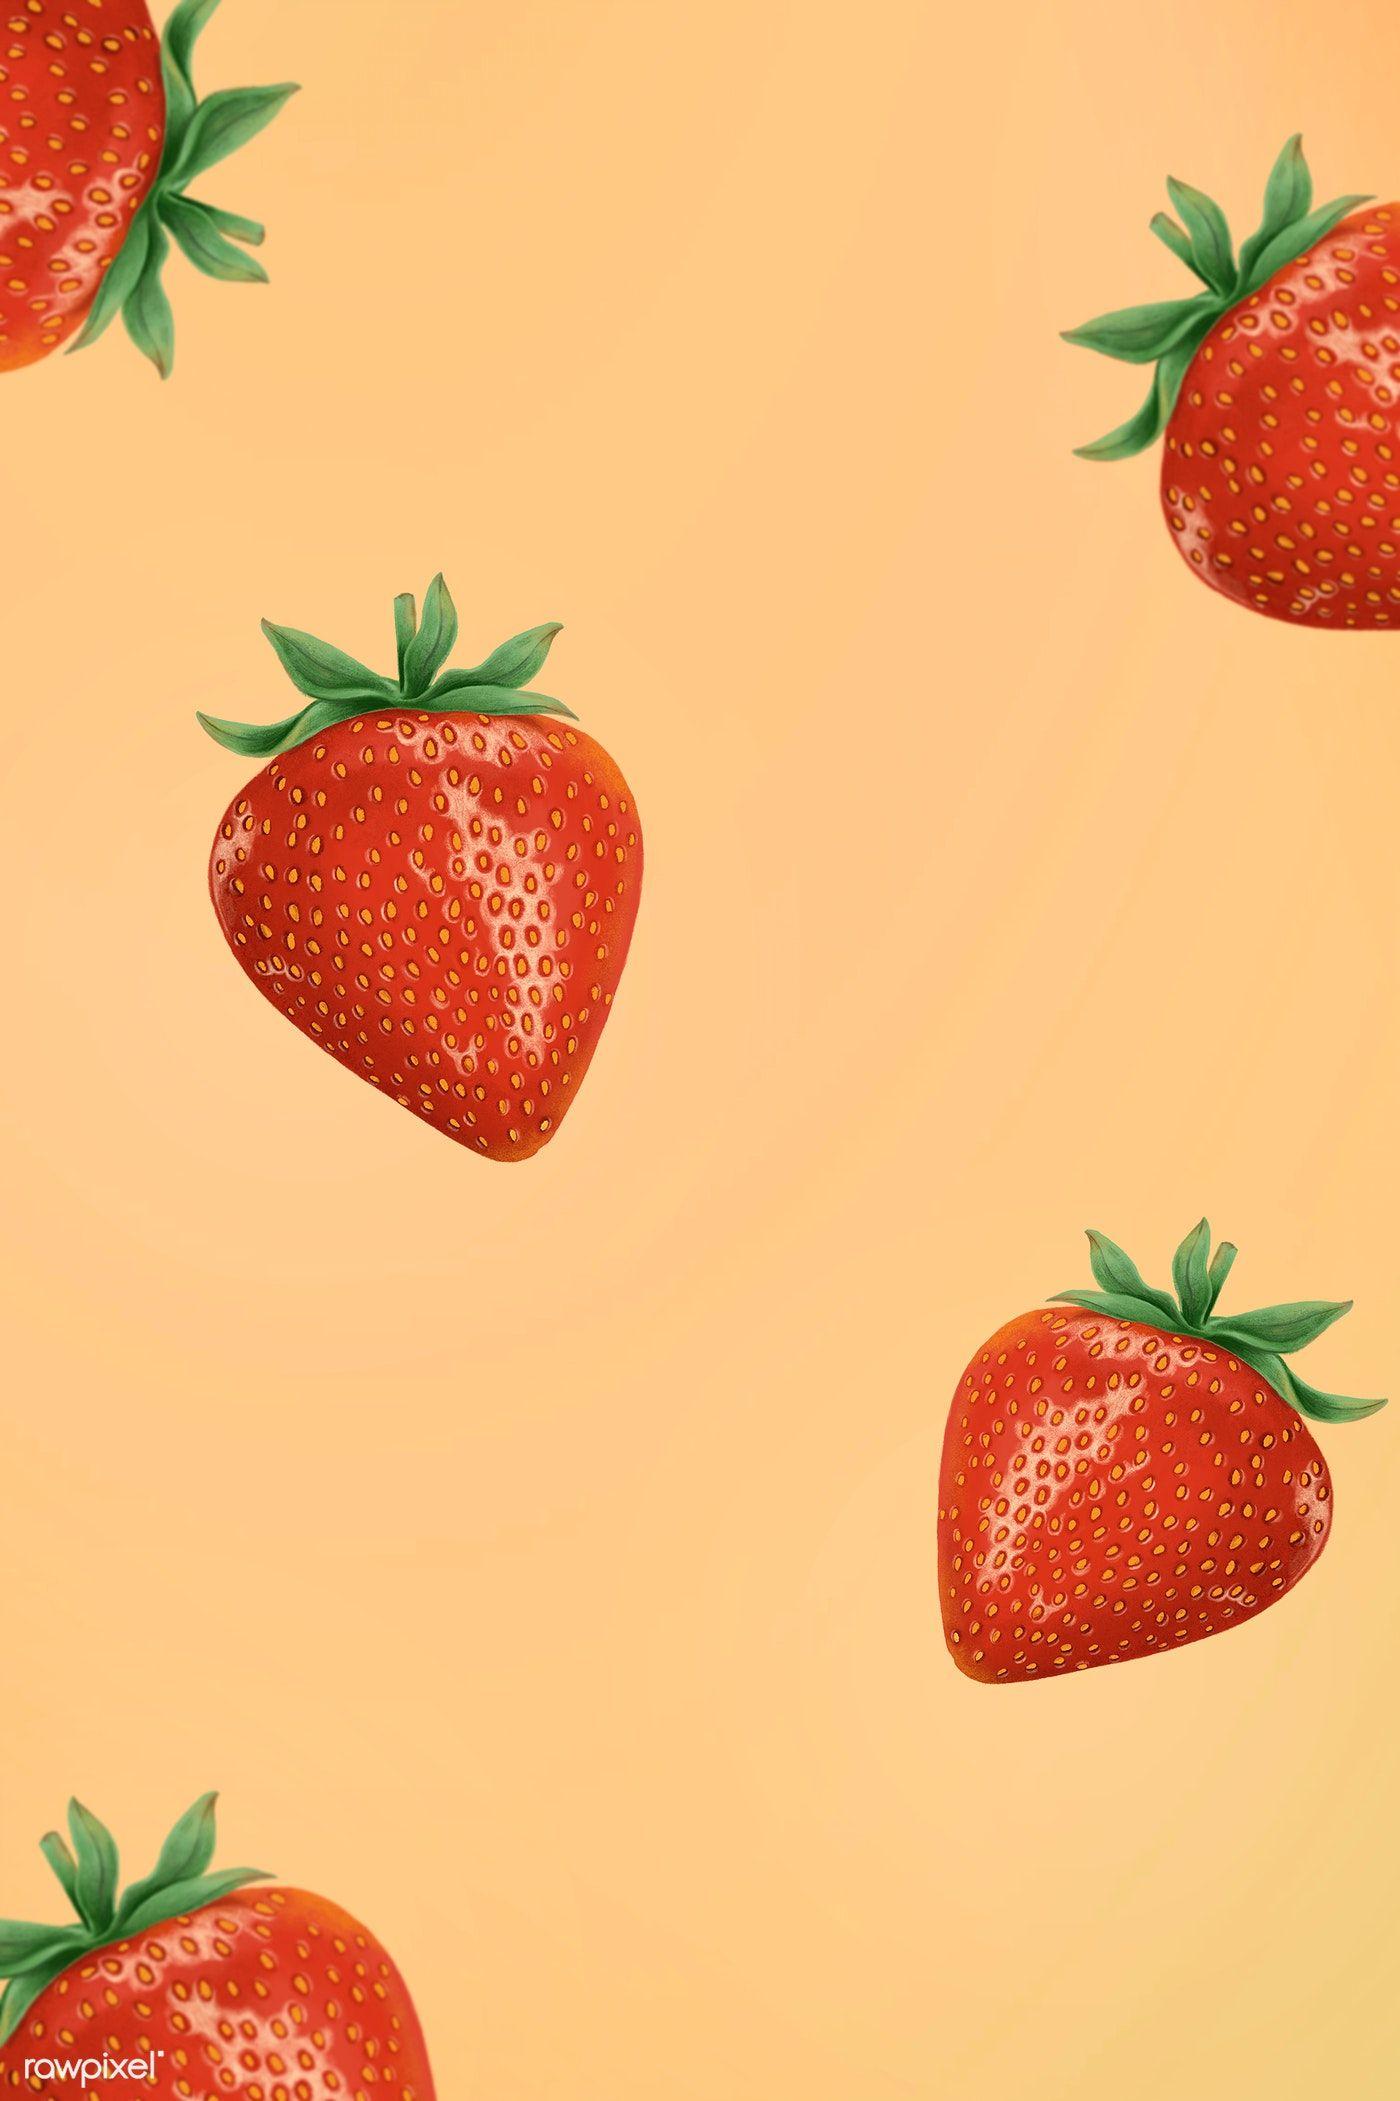 Fresh juicy strawberry patterned background free image